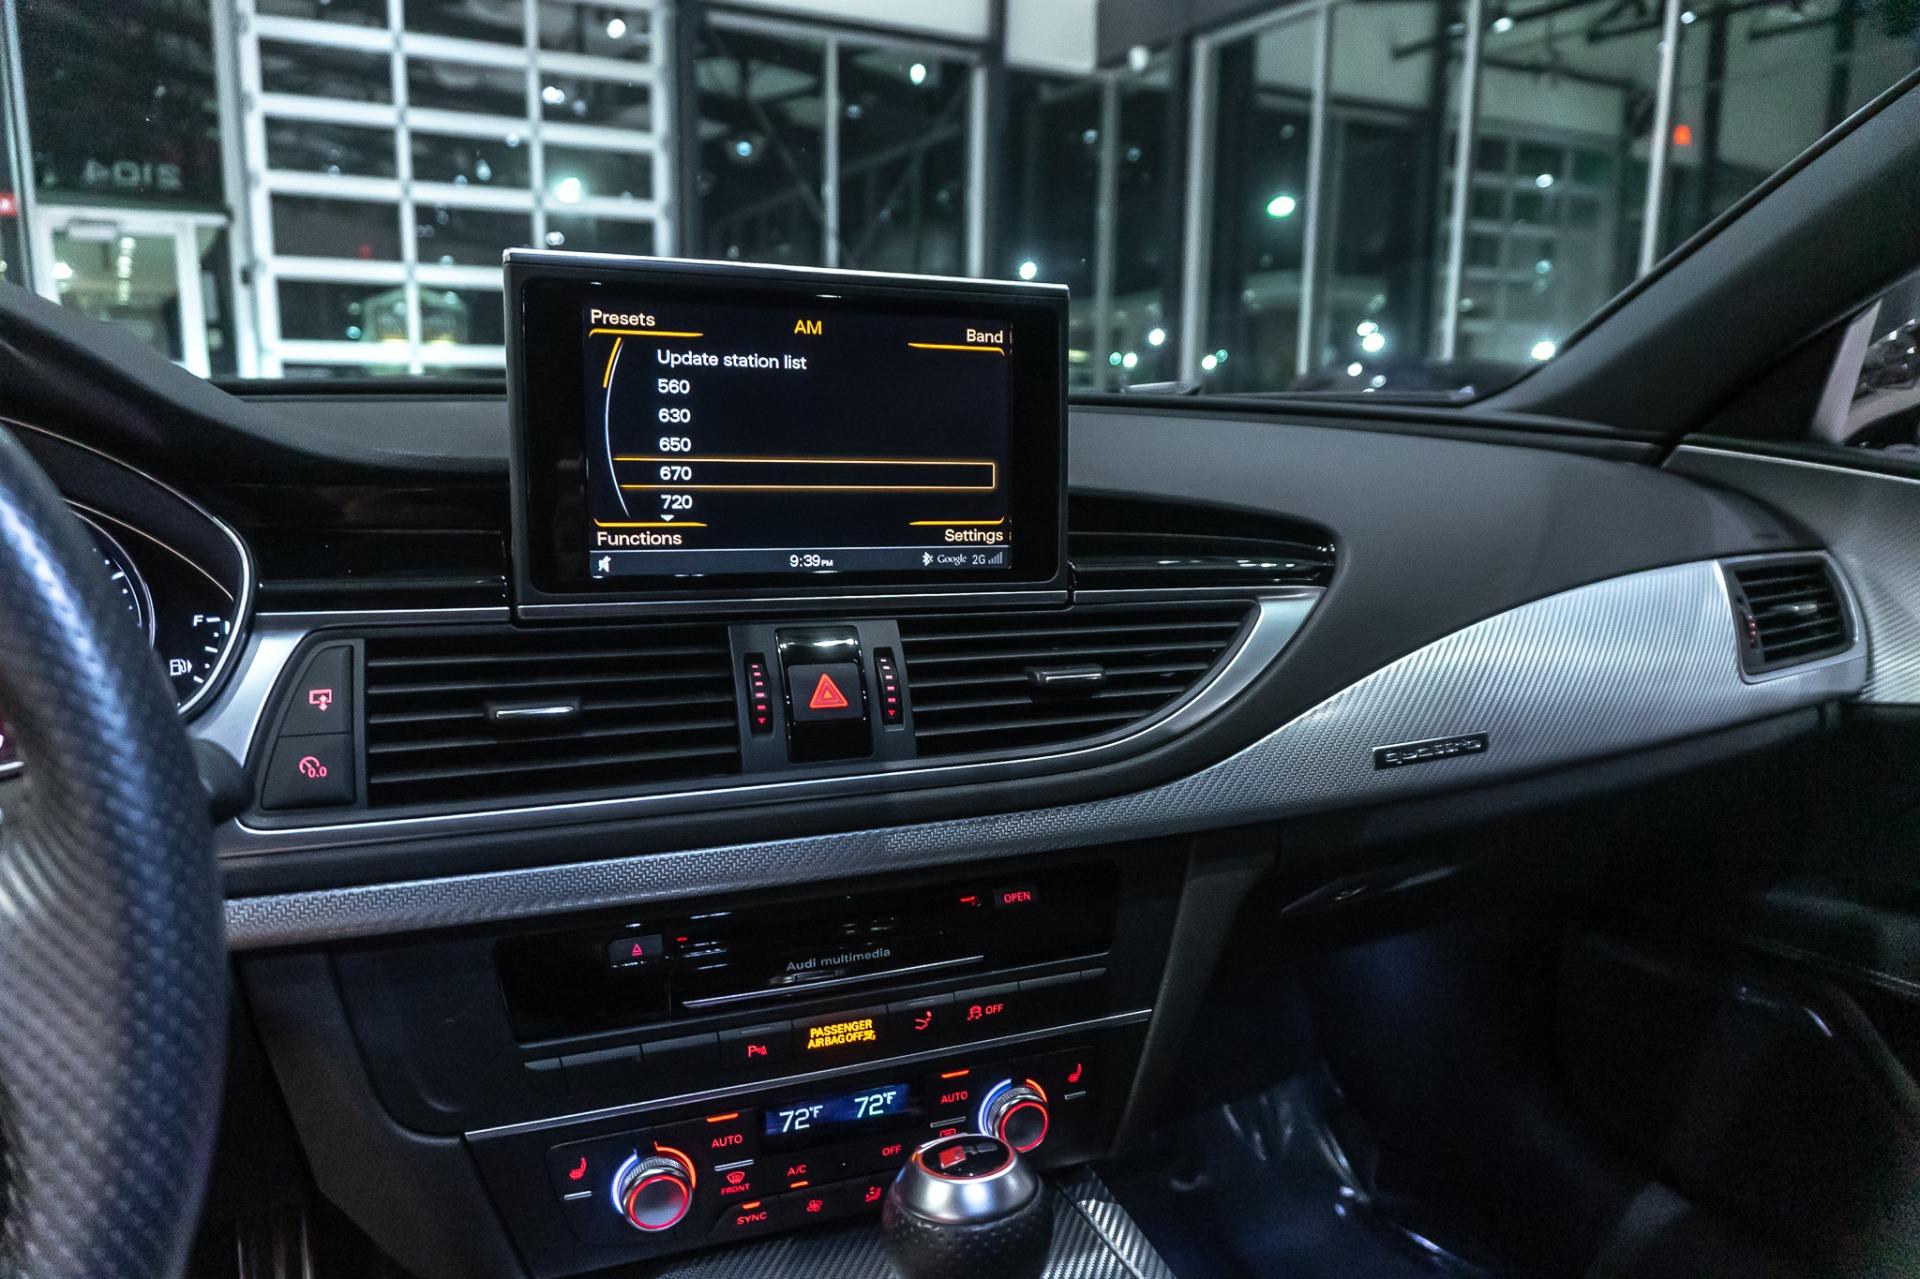 Used-2015-Audi-RS7-40T-quattro-Prestige-Sedan-Milltek-Exhaust-APR-Tune